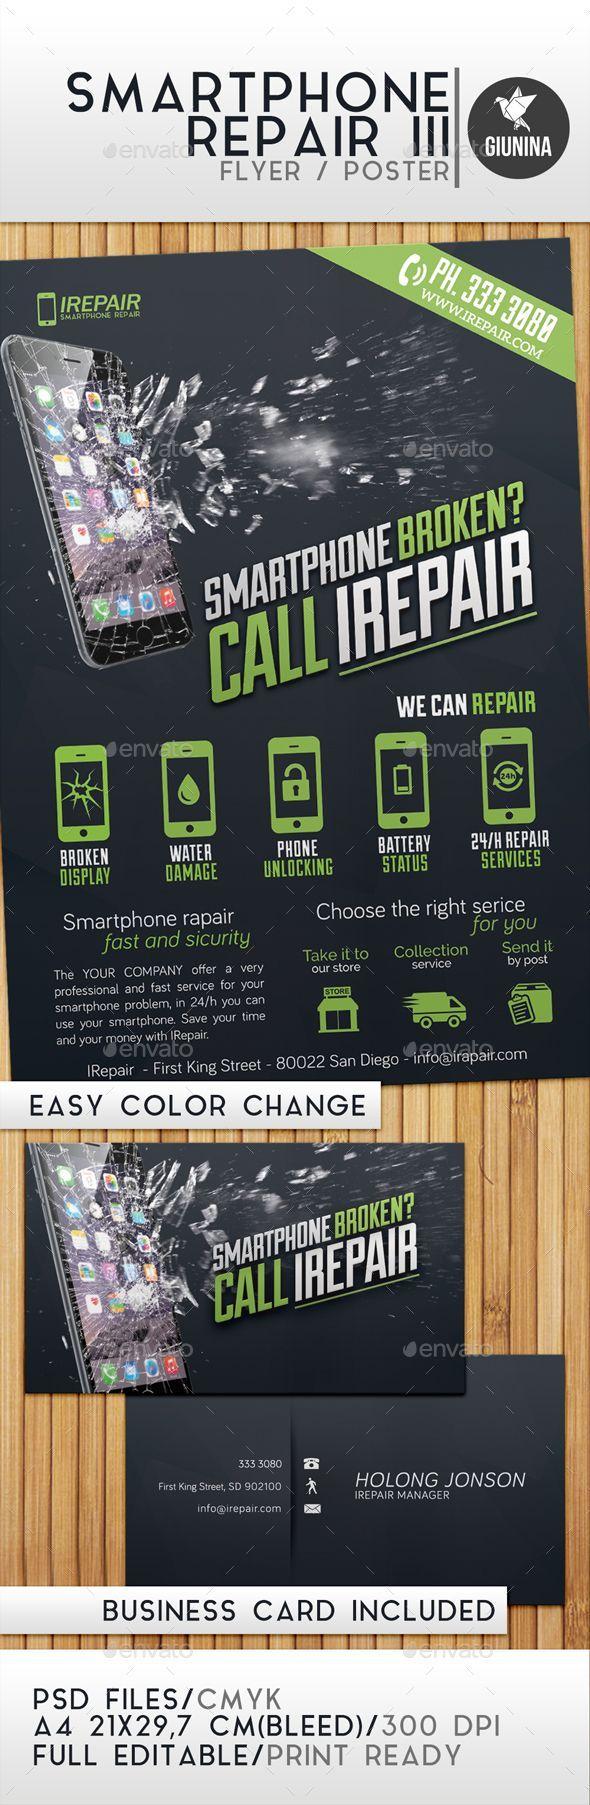 Smartphone Repair 3 Flyer Poster Template Psd Design Download Http Graphicriver Net Item Smartphone Repair 3 F Smartphone Repair Smartphone Iphone Repair